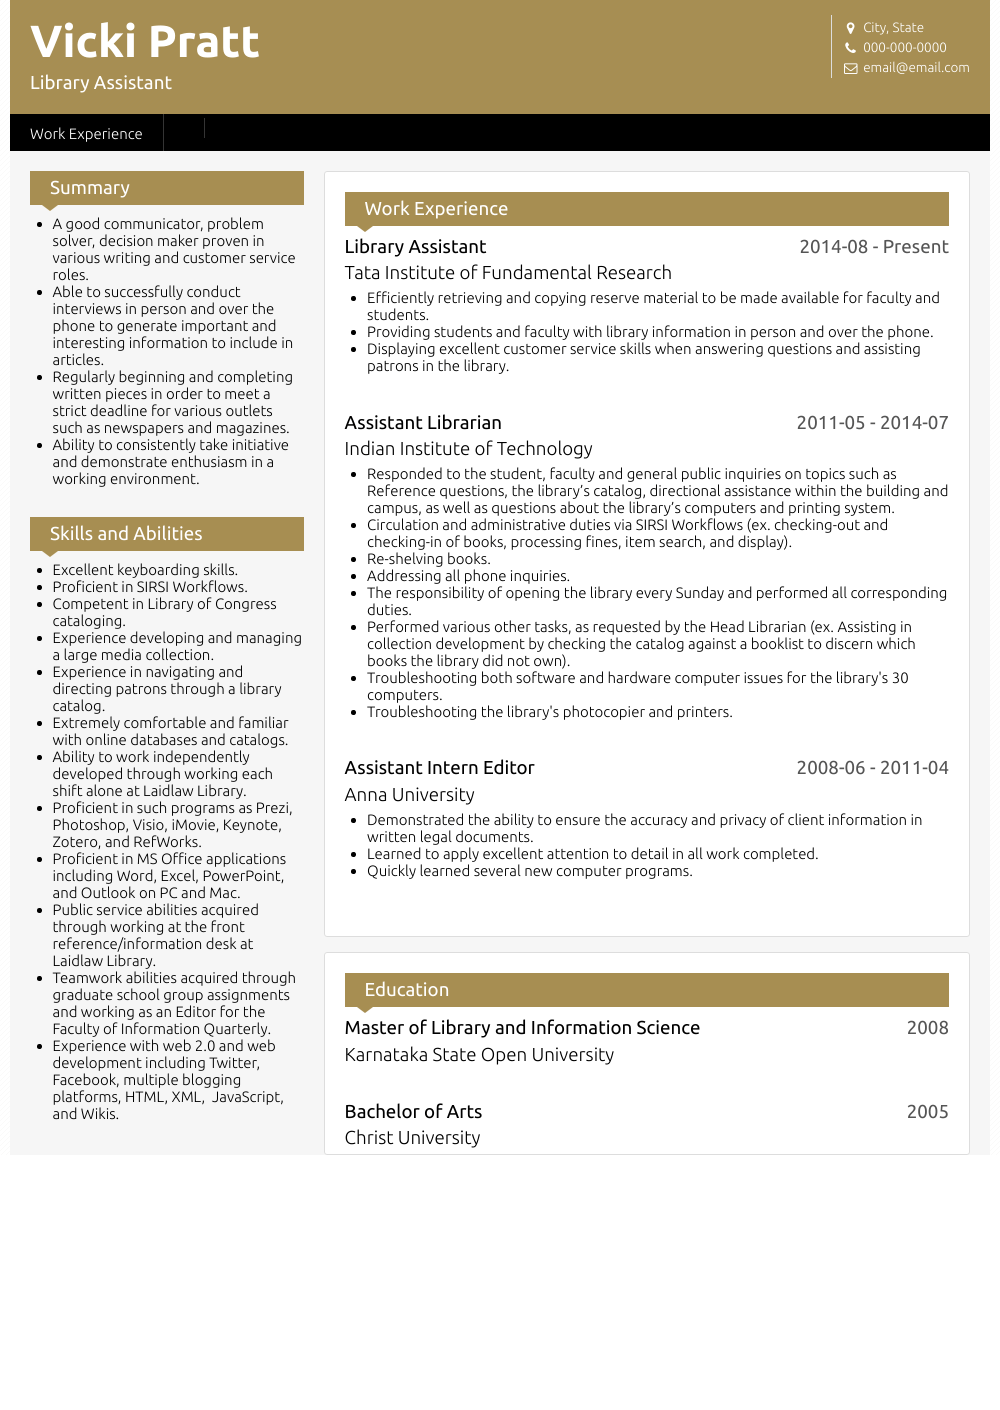 standard cv form